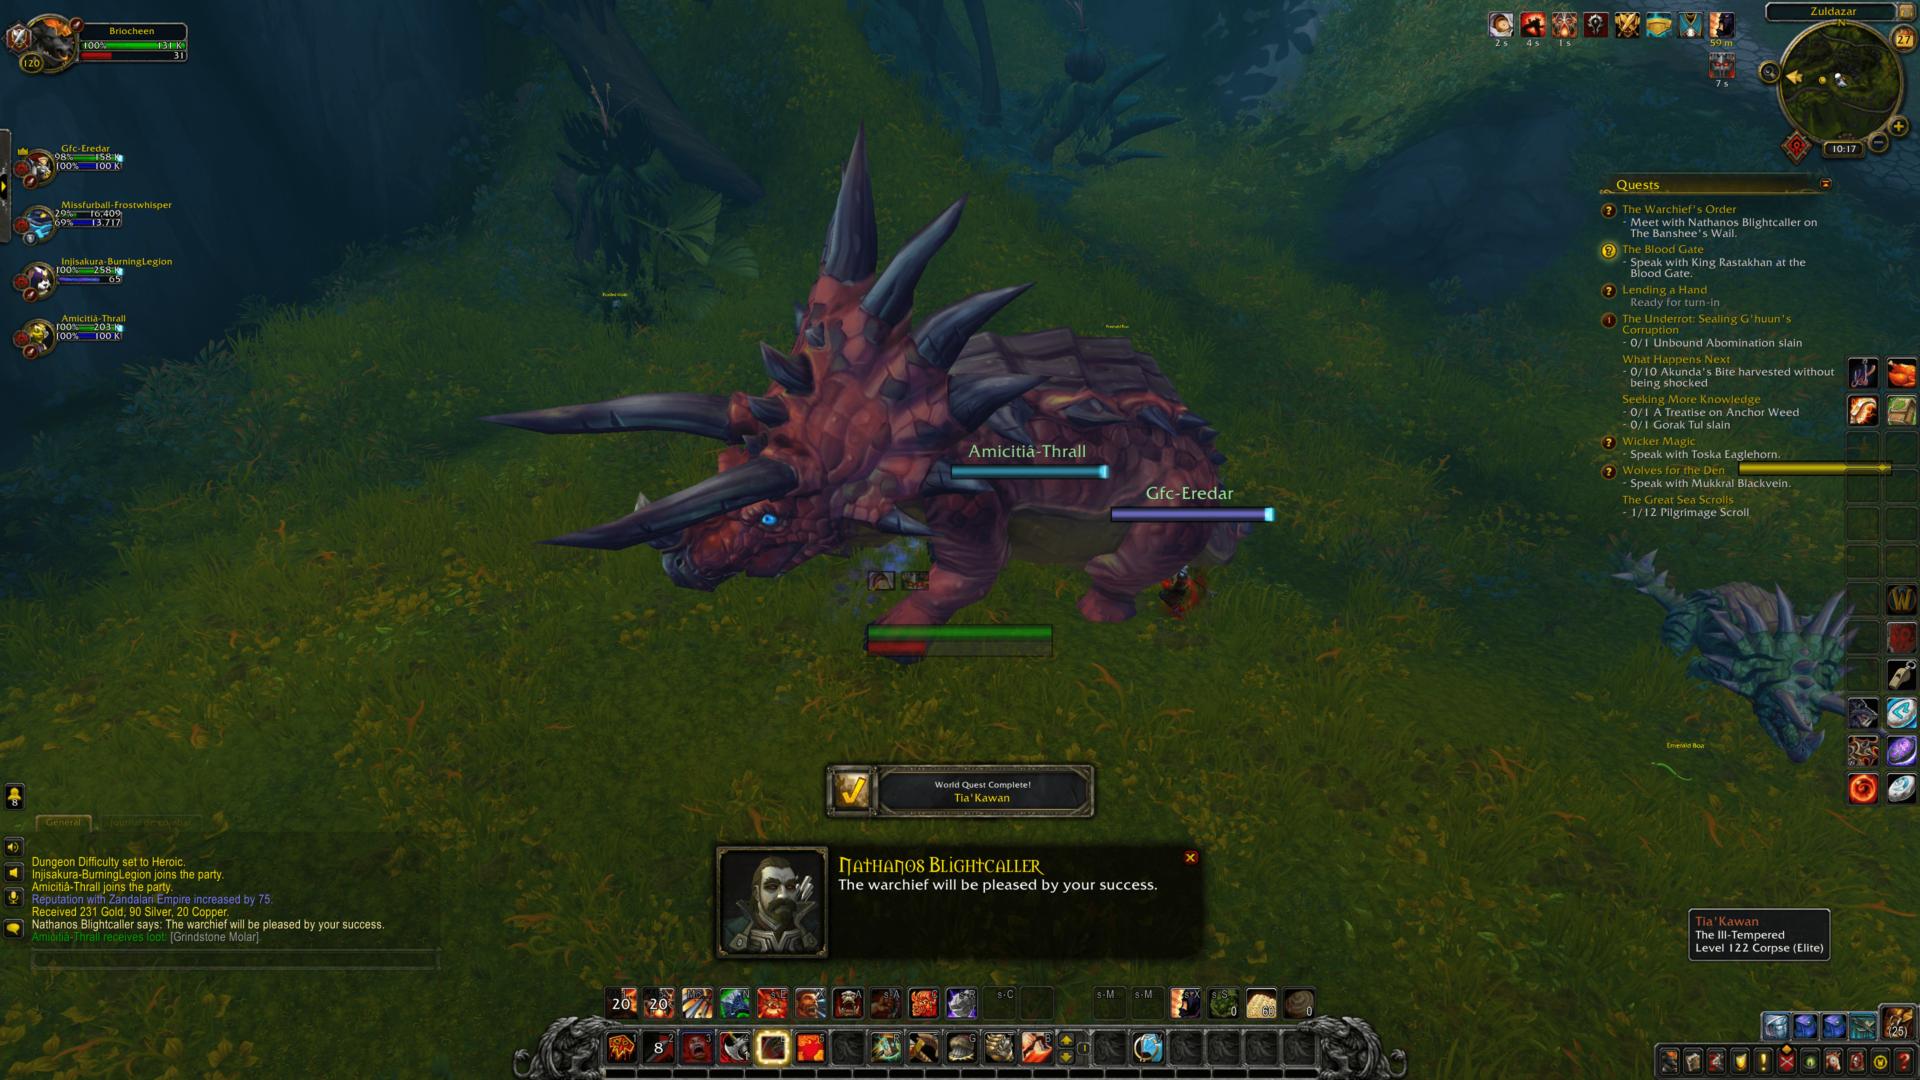 Dialogue screenshot of World of Warcraft video game interface.